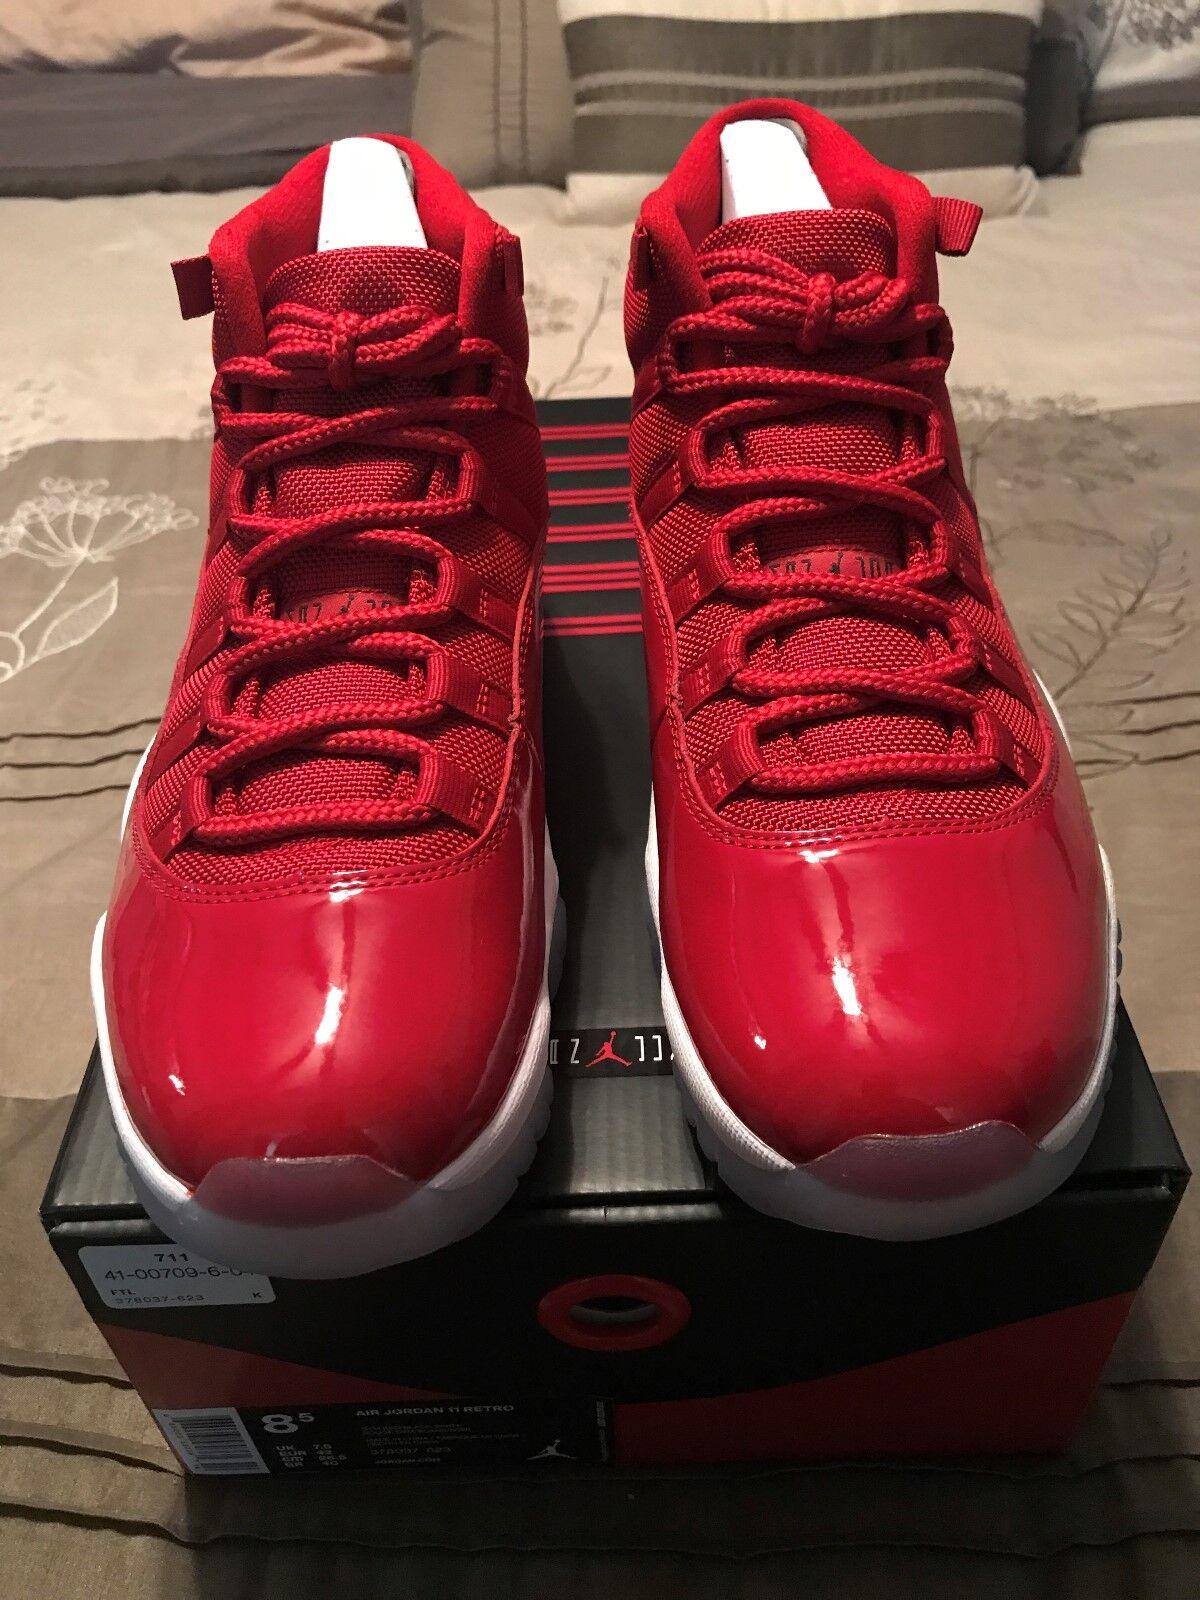 Nike Air Jordans 11 Win Like '96  Gym Red  size 8.5